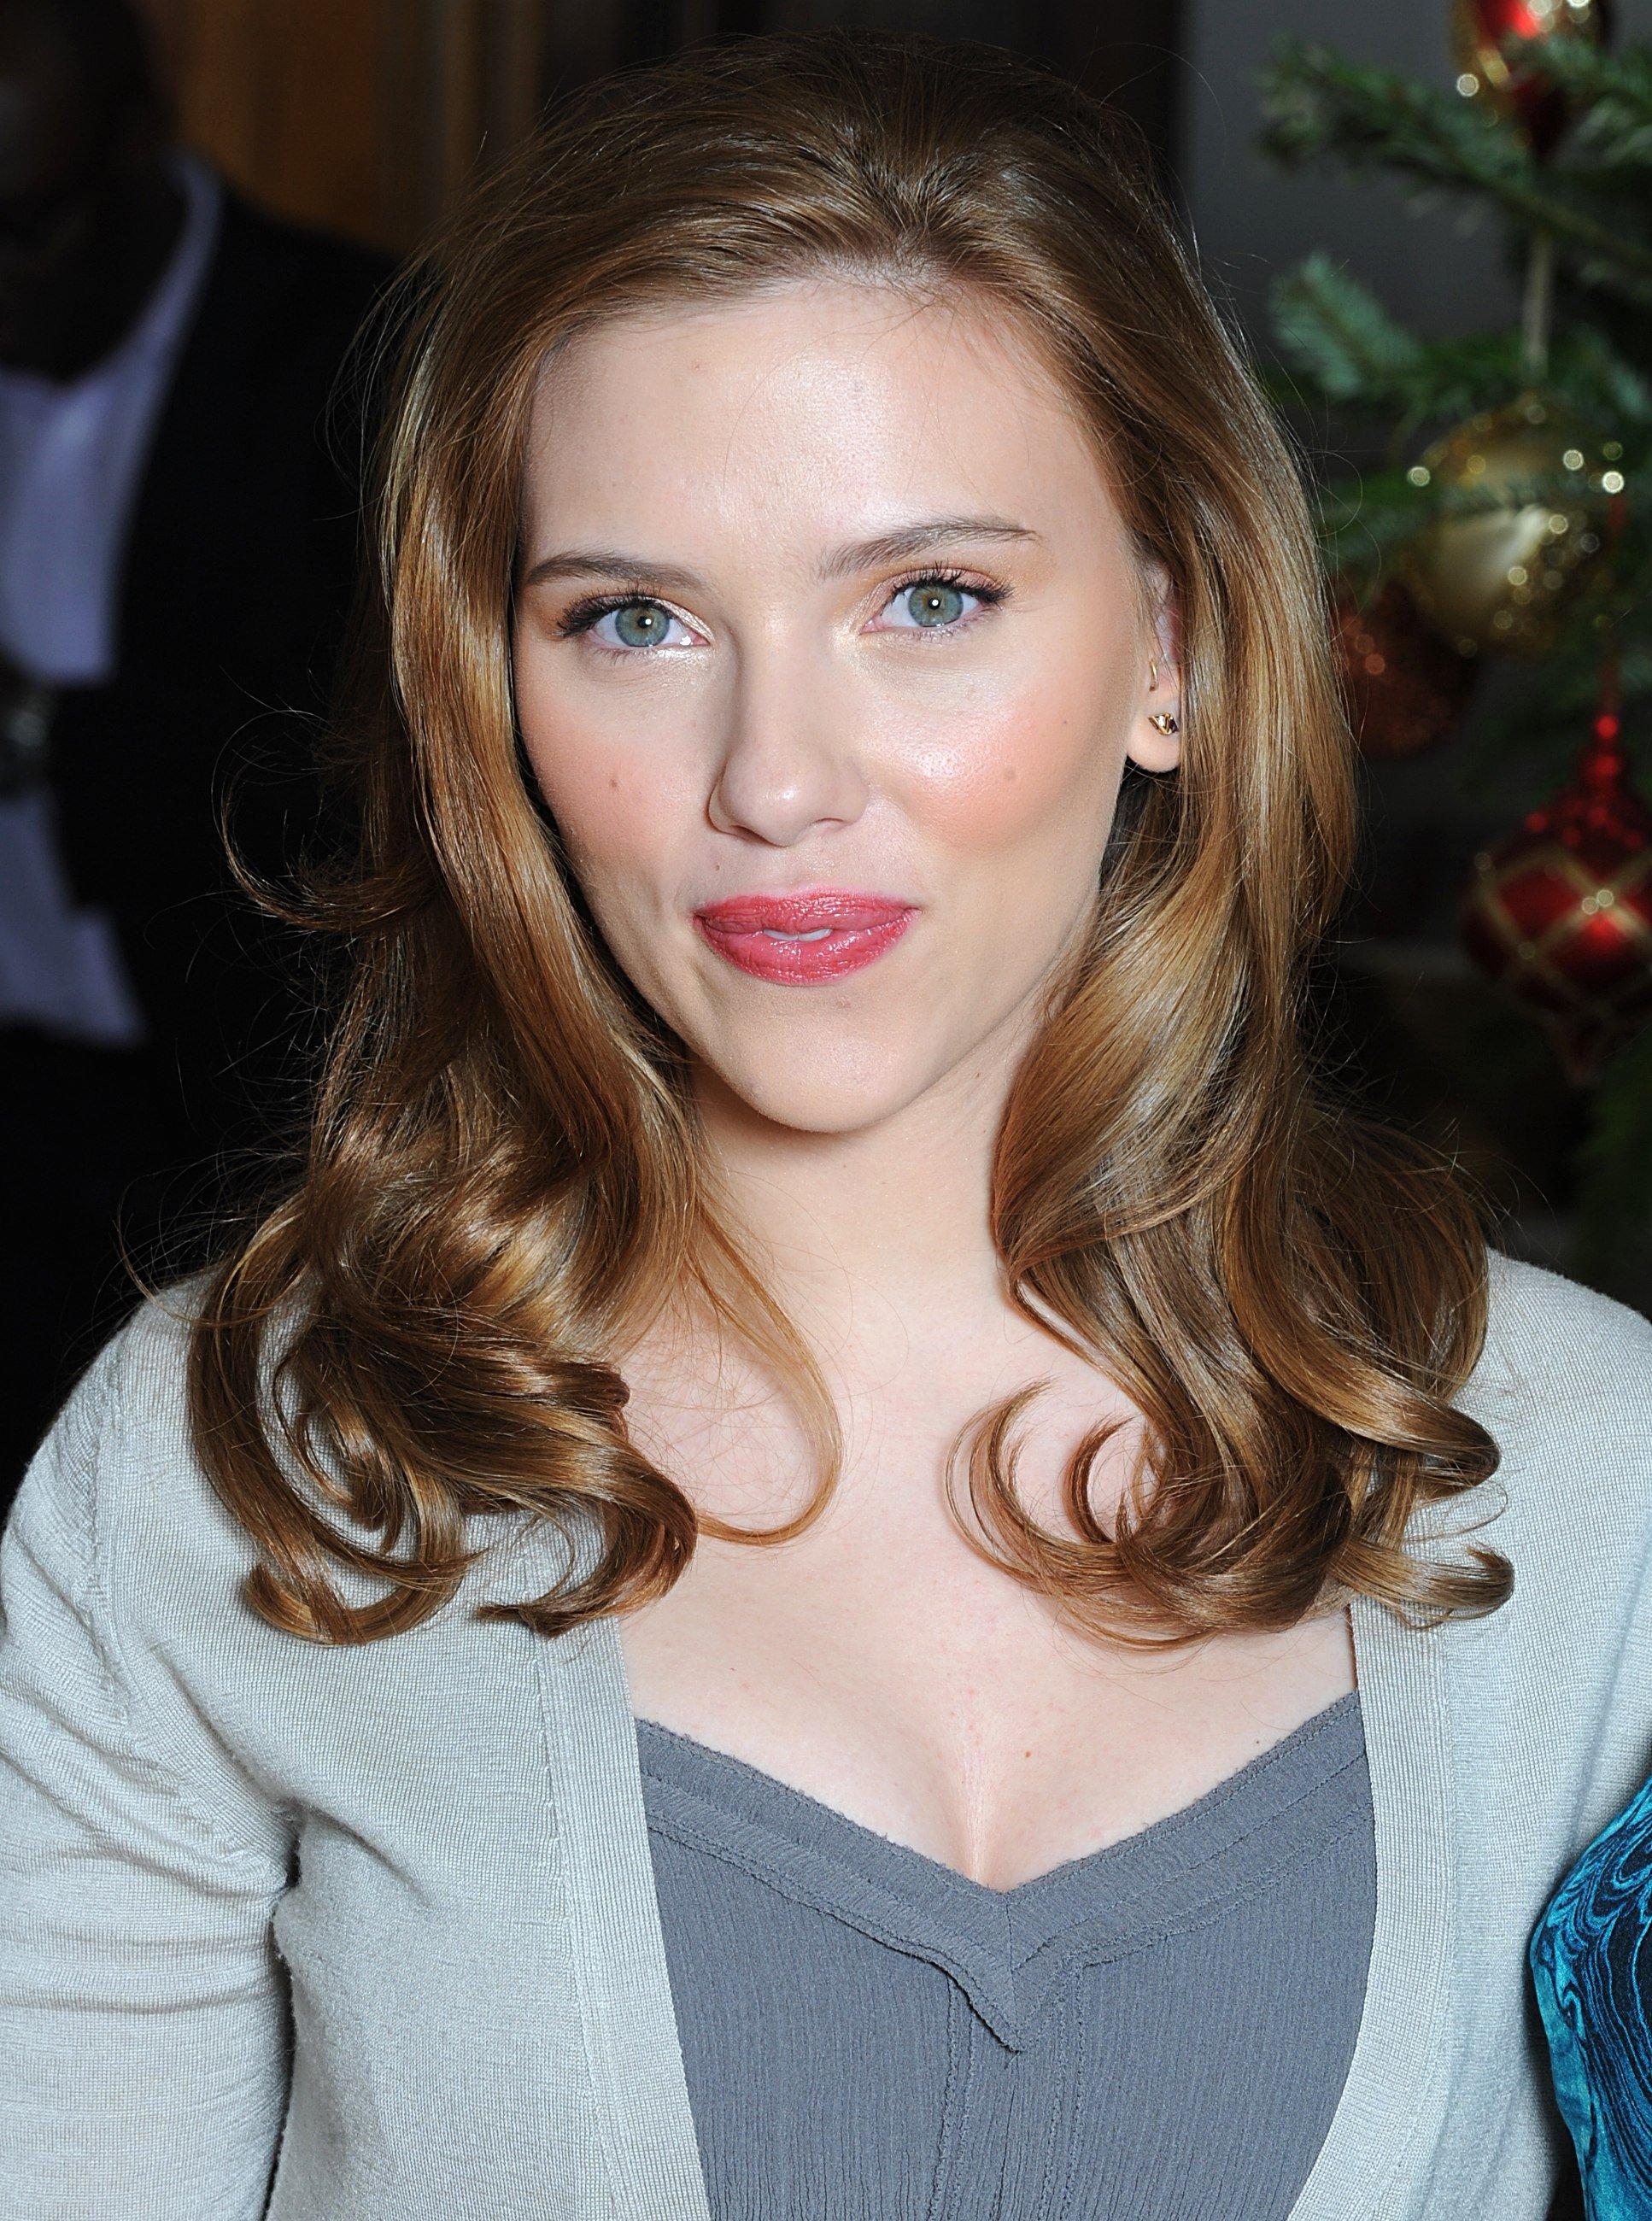 16132_Celebutopia-Scarlett_Johansson-The_Spirit_photocall_in_London-02_122_1006lo.jpg